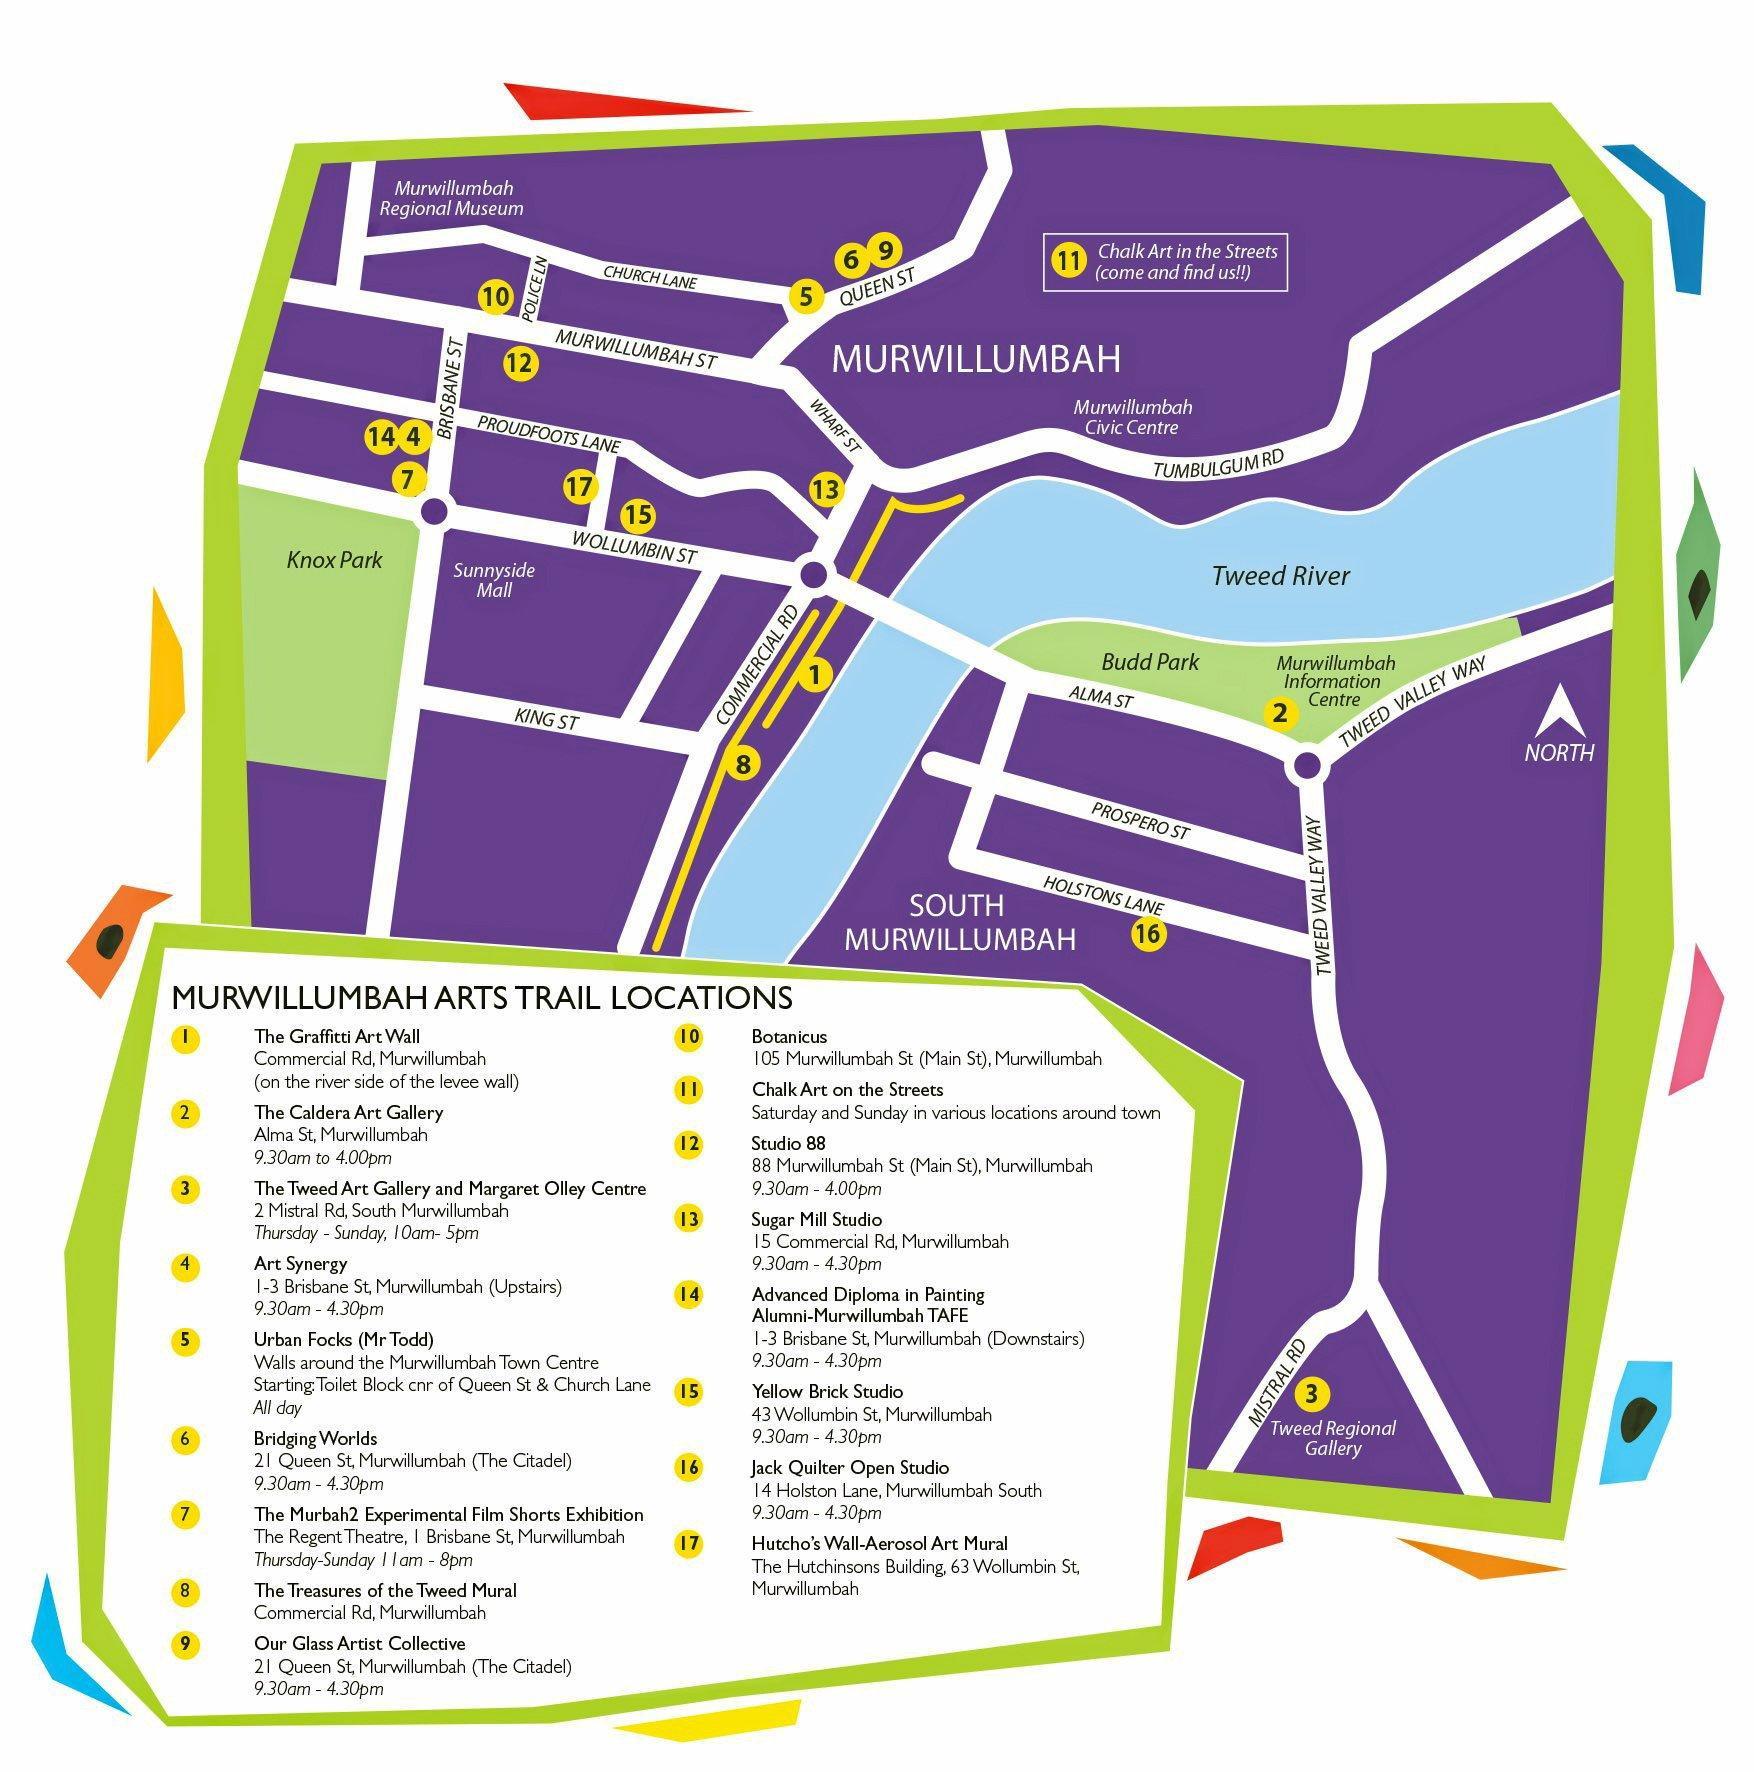 The Murwillumbah Art Trail's 2016 locations.